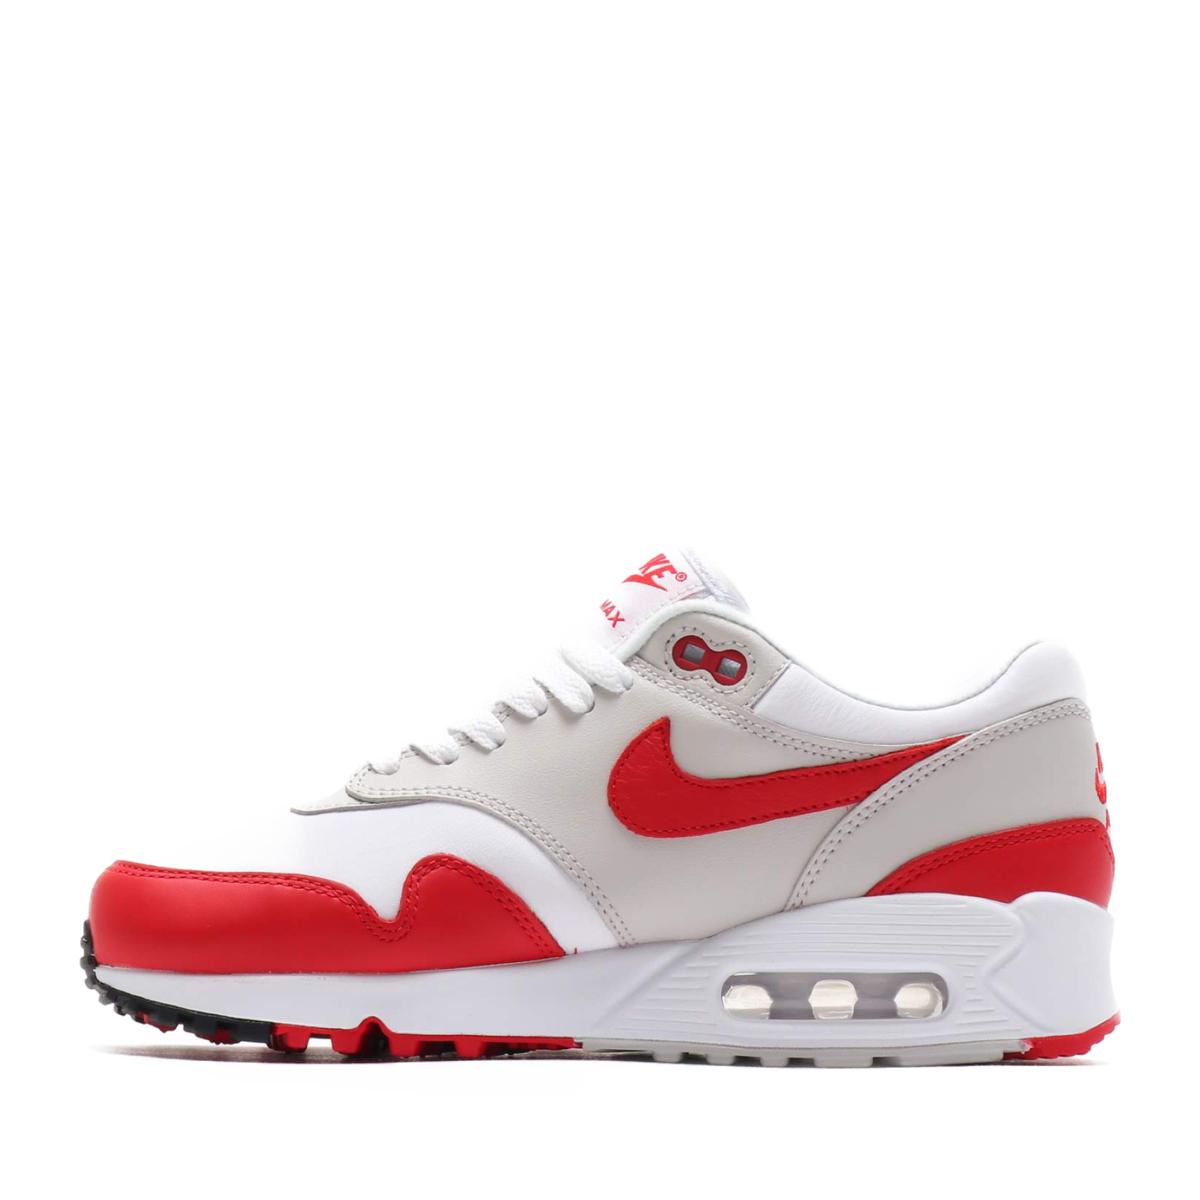 NIKE W AIR MAX 90 1 (Nike women Air Max 90 1) WHITE UNIVERSITY RED-NEUTRAL  GREY-BLACK 18FA-S fe9727649dc8